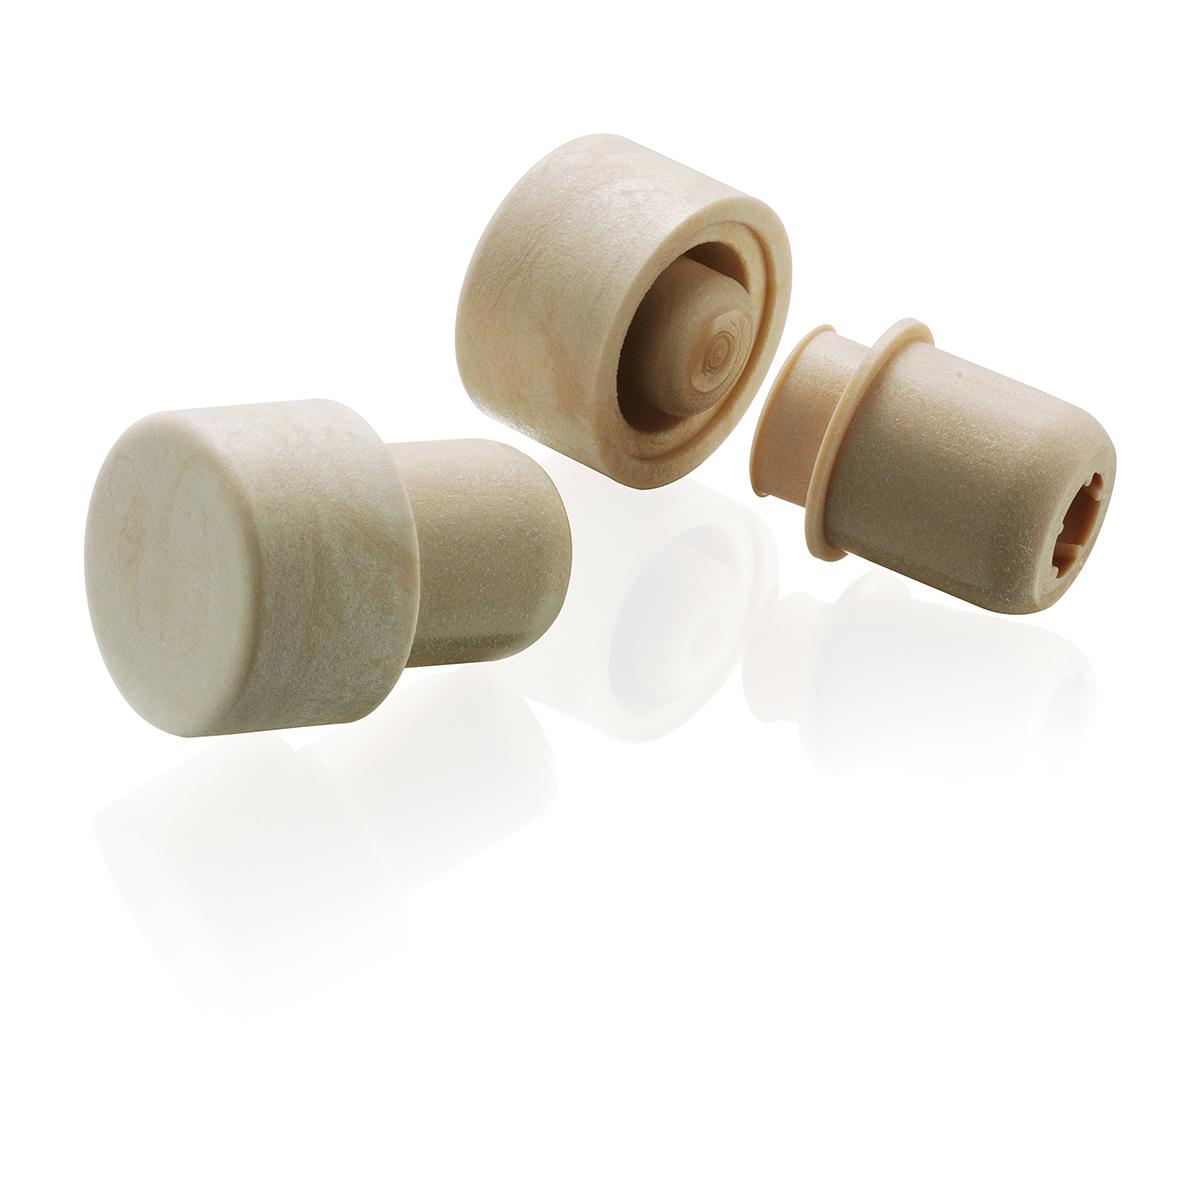 thetis pack πώμα συνθετικό με δείκτη ροής wooden head synthetic cap versatore pourer